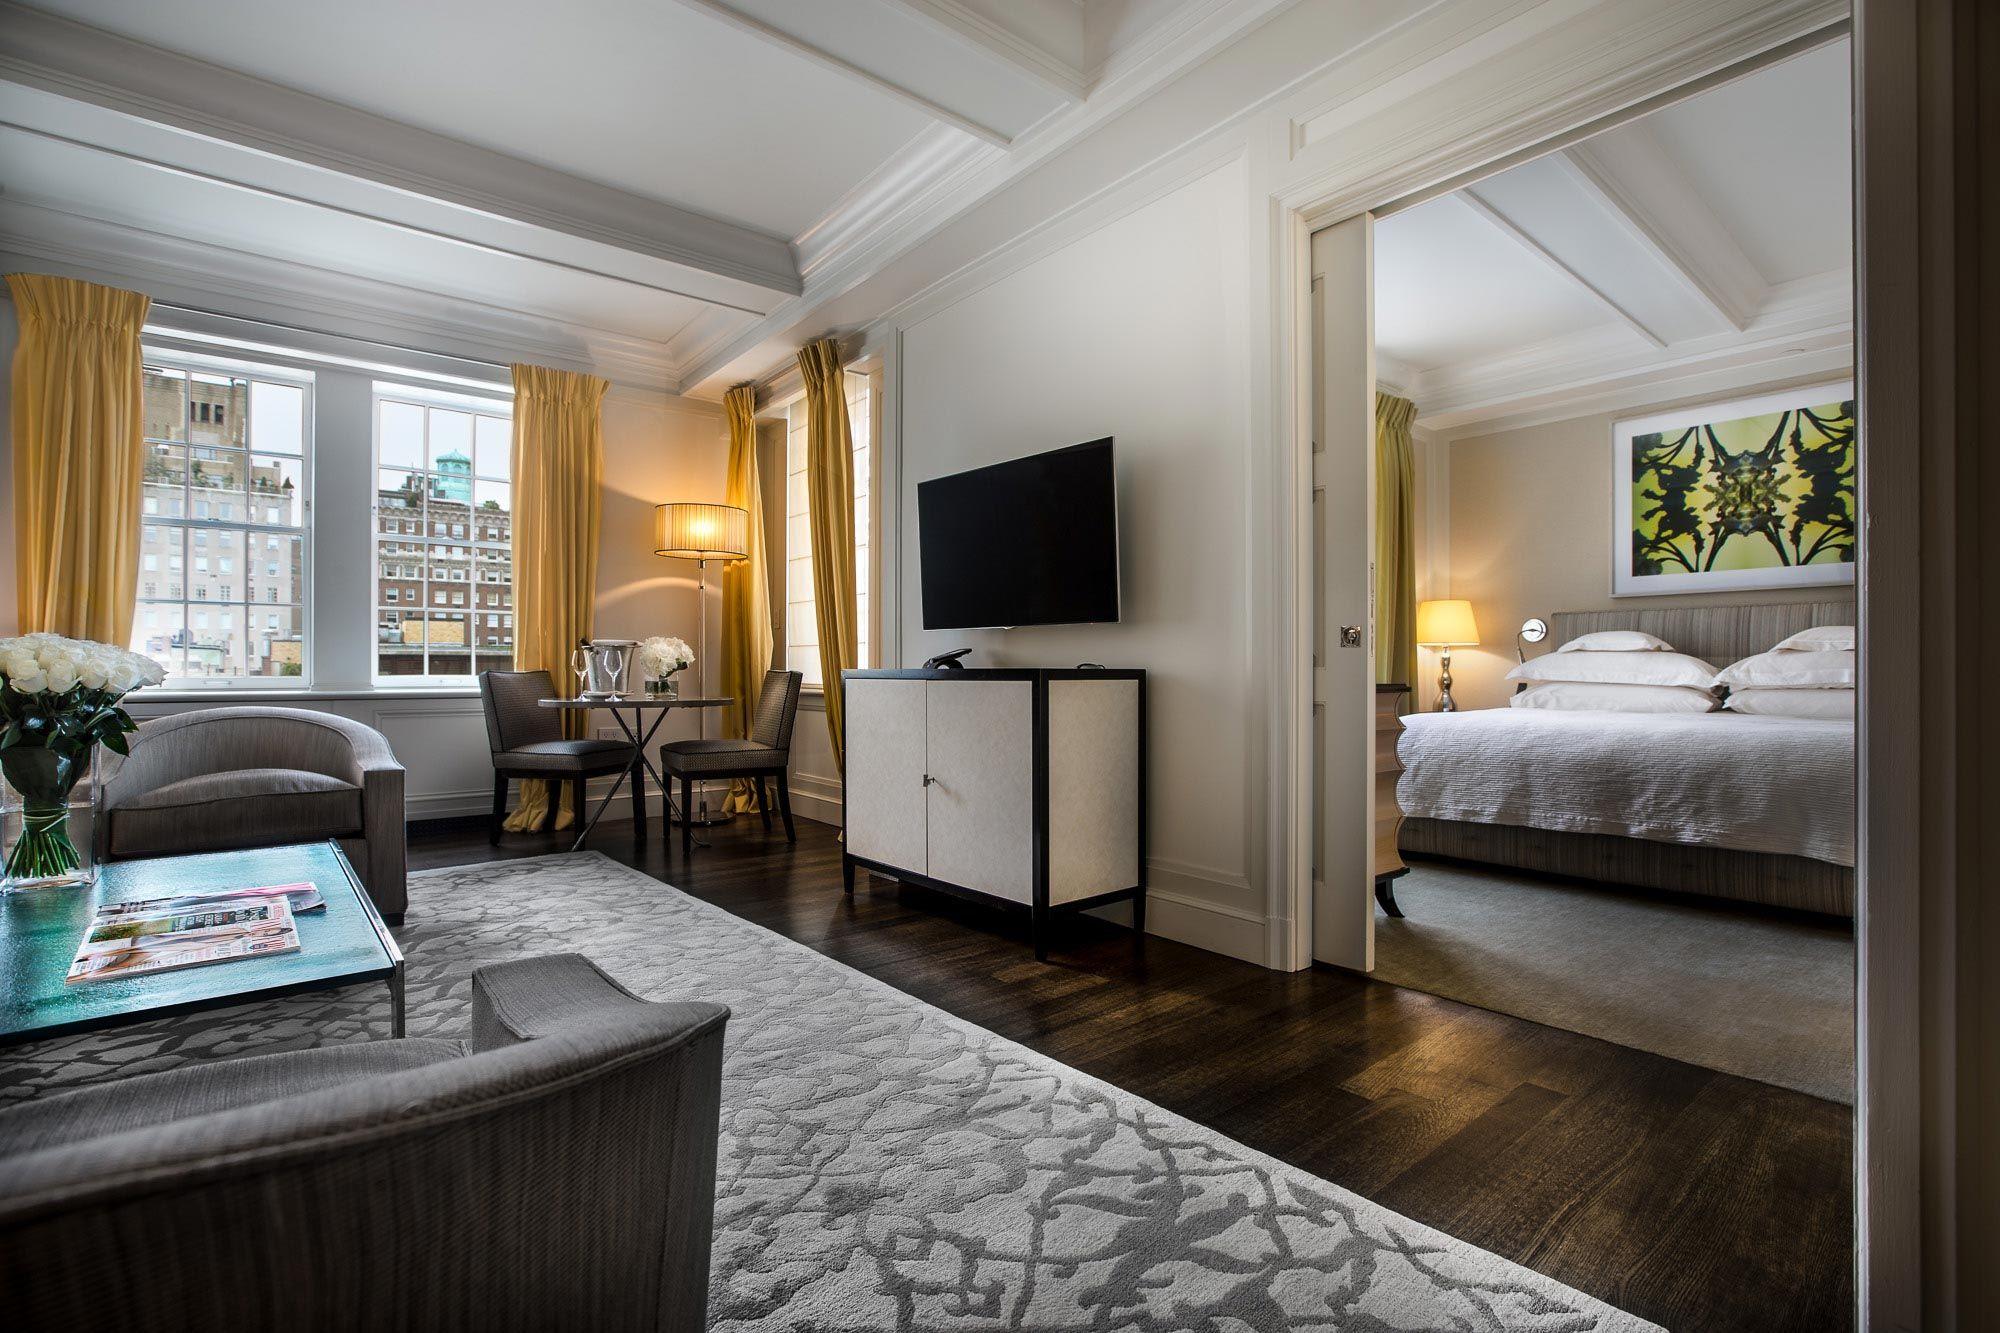 5 Star Luxury Hotels in Manhattan NYC | The Mark Hotel ...